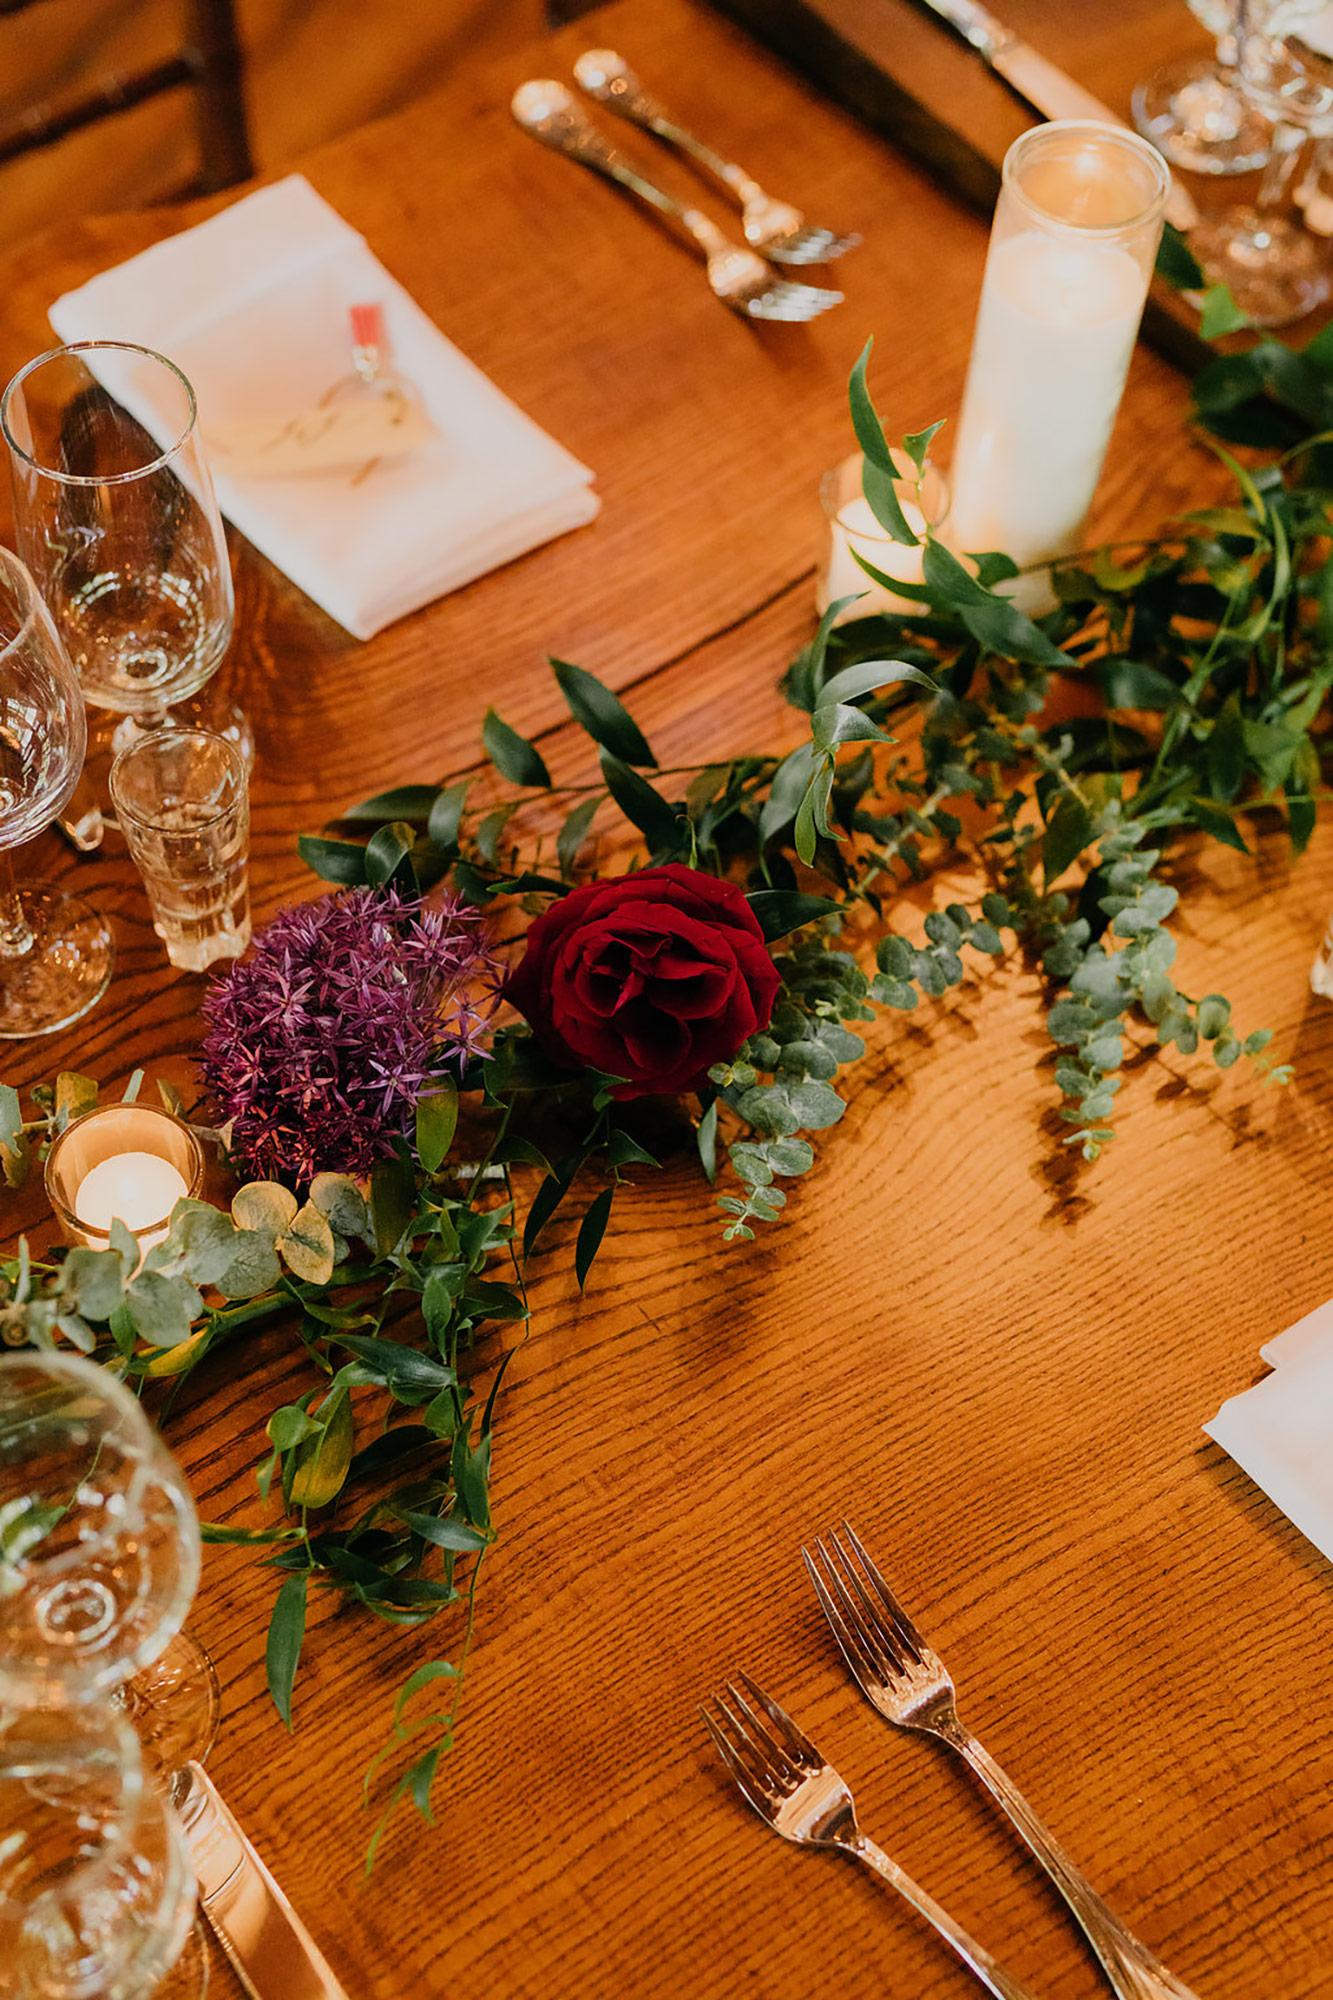 Kurtz-Orchards-Wedding-Niagara-wedding-Vineyard-Bride-Photography-by-Kayla-Rocca-031.JPG